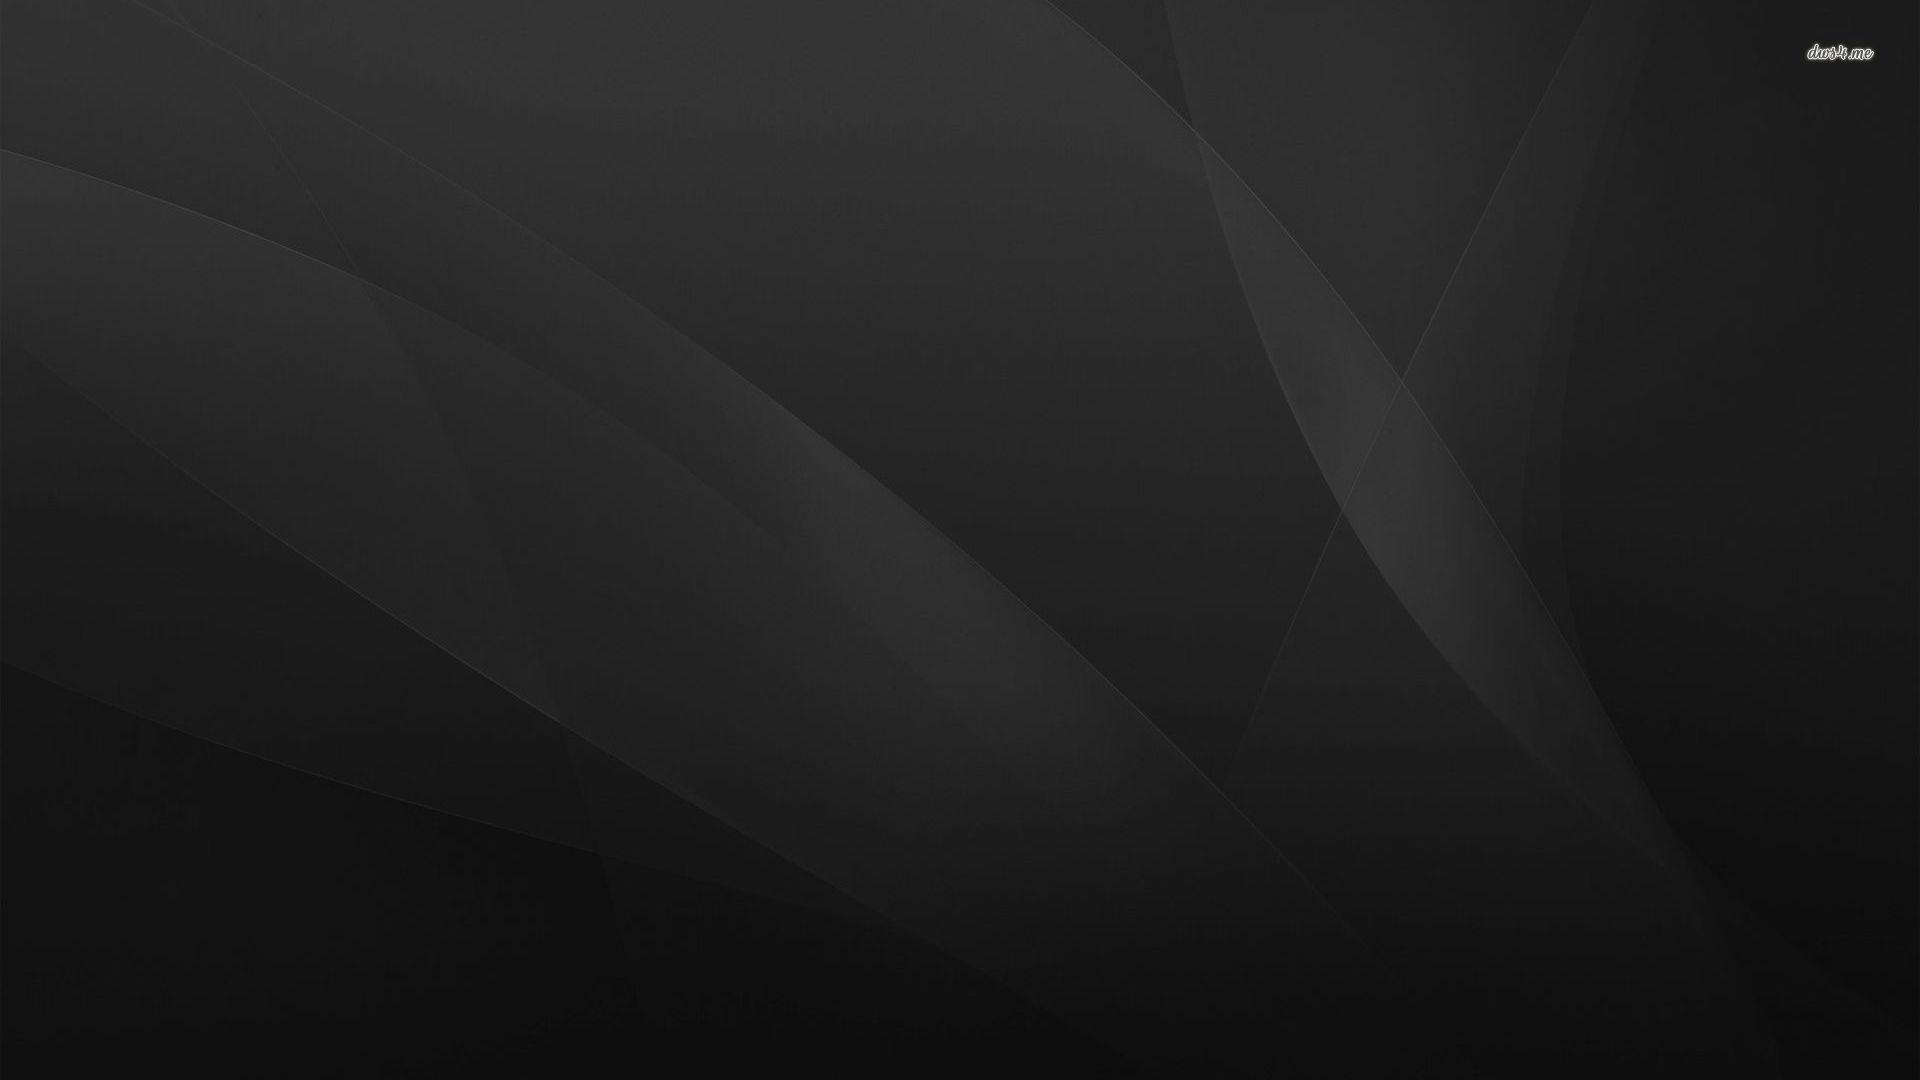 Dark Grey Wallpaper Iphone Texture Pinterest Grey And Dark 1920x1080